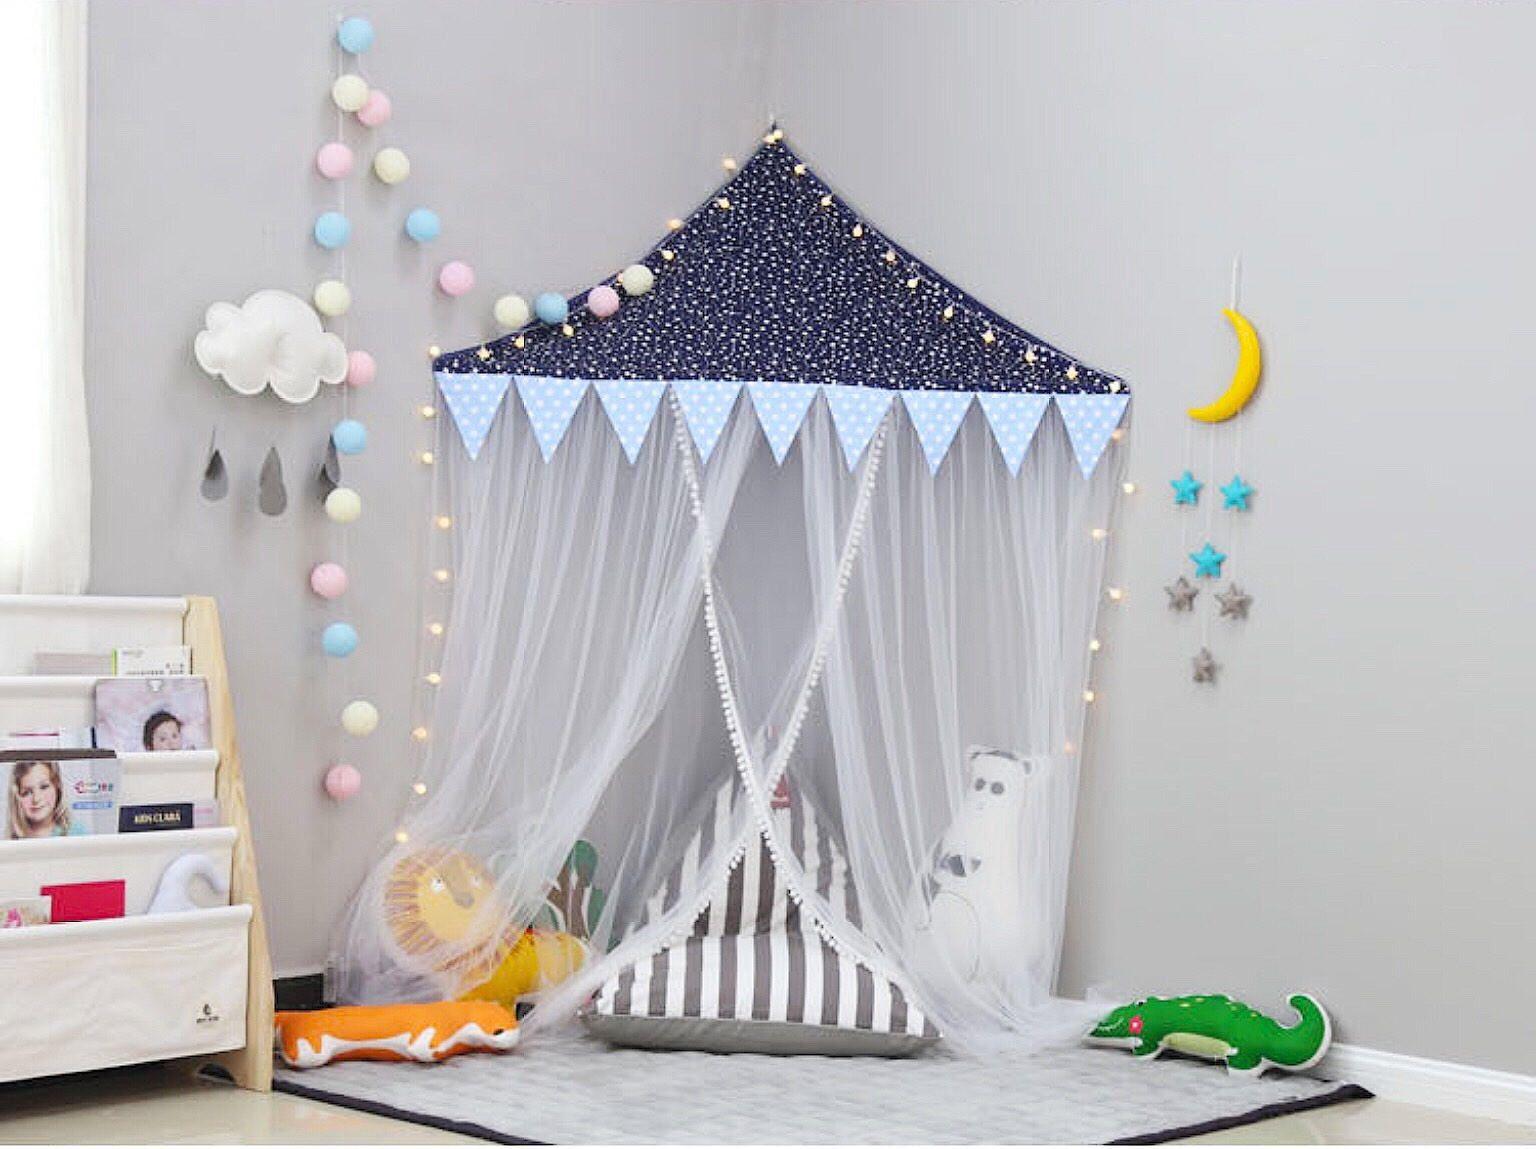 Teepee  kids playroom wall canopy  kids room  nursery decor  play tent & Teepee  kids playroom wall canopy  kids room  nursery decor ...